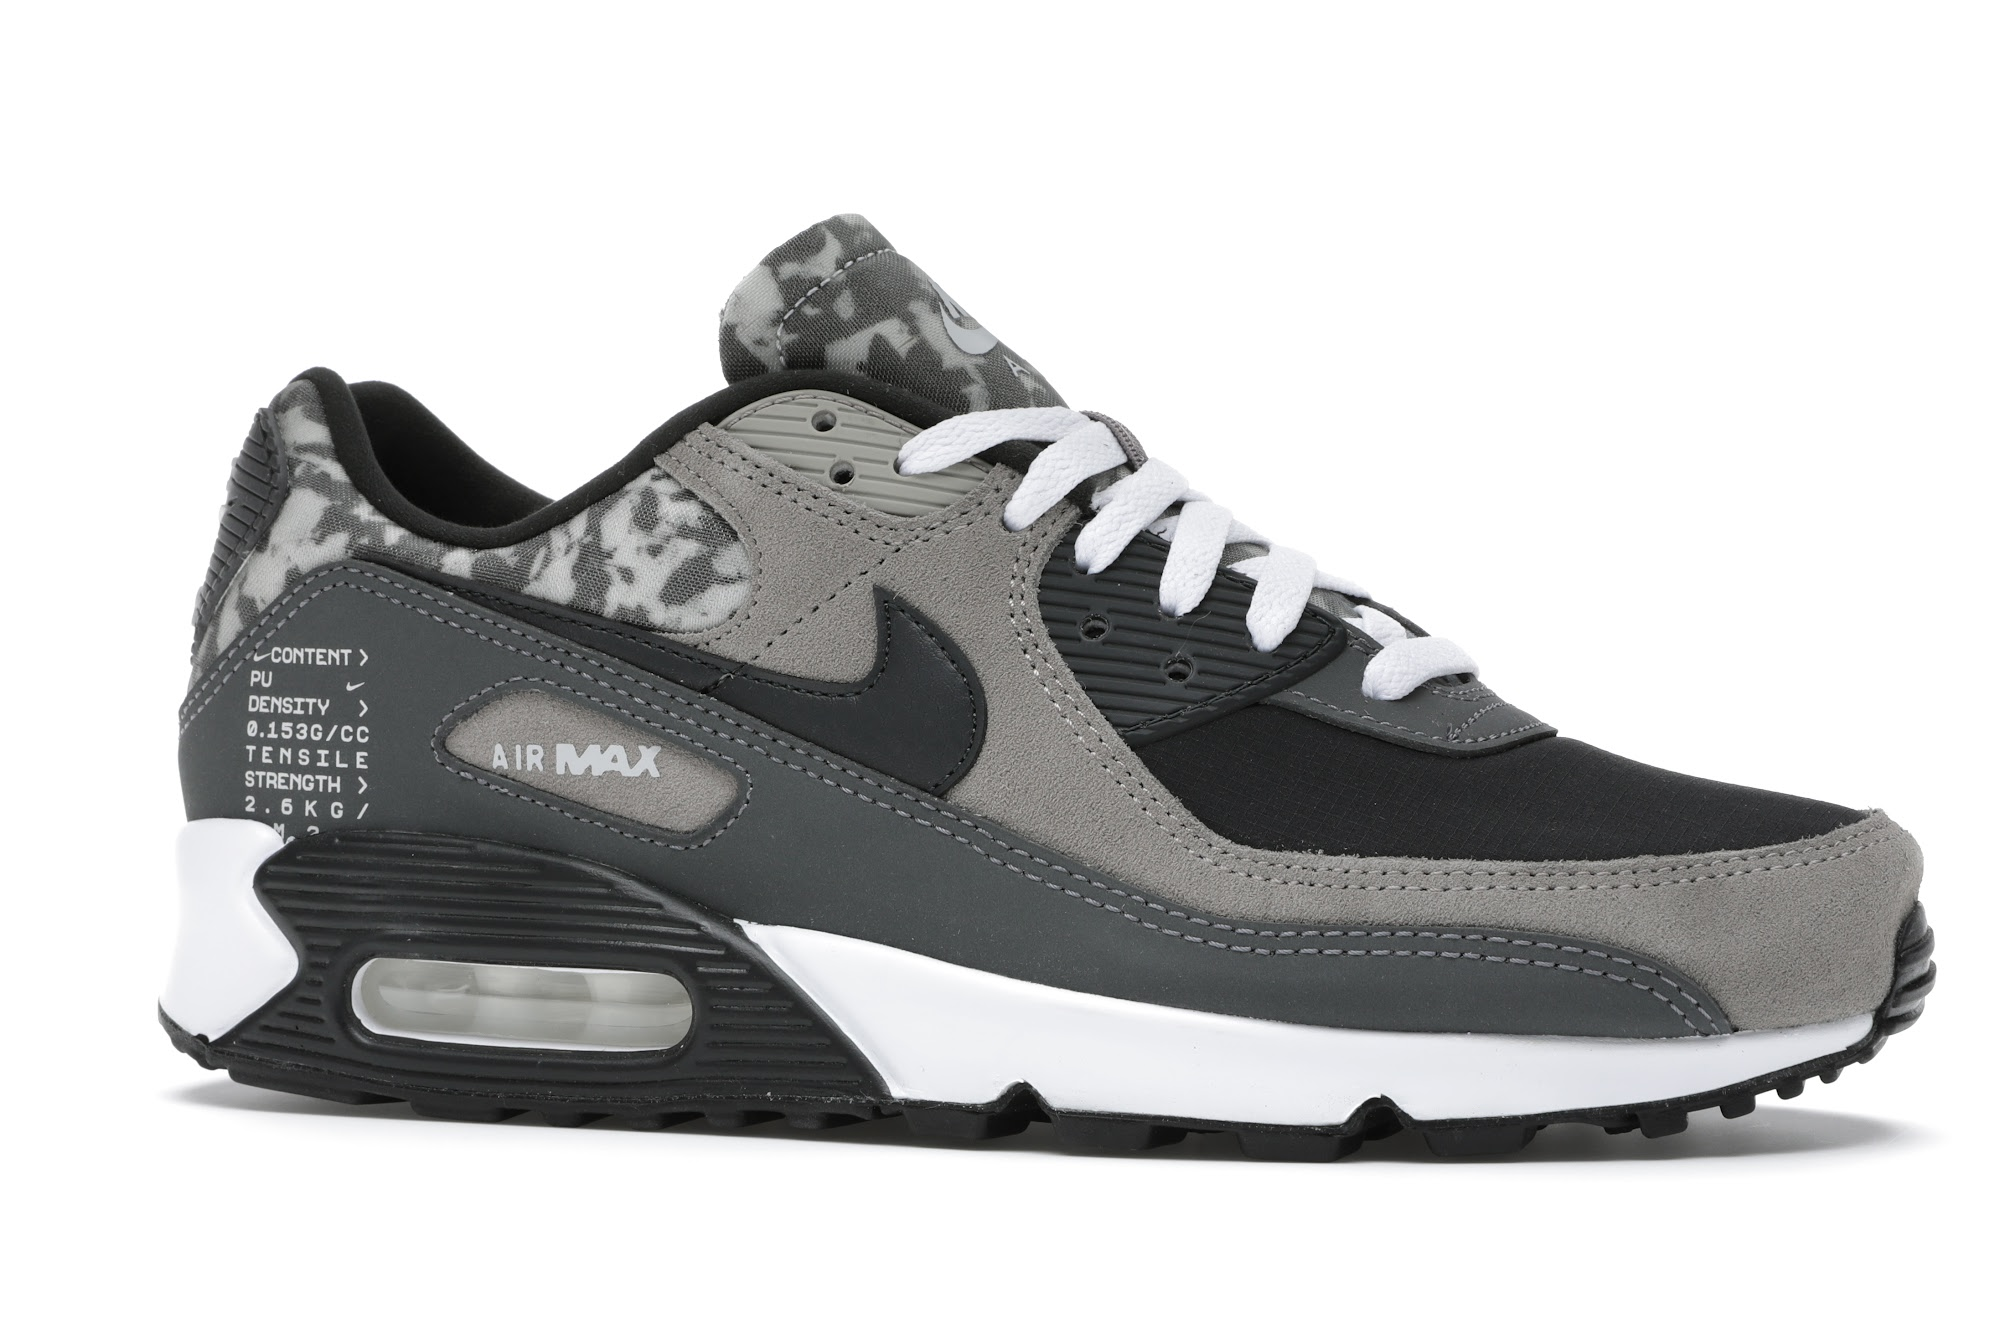 Nike Air Max 90 Enigma Stone - CT1688-001